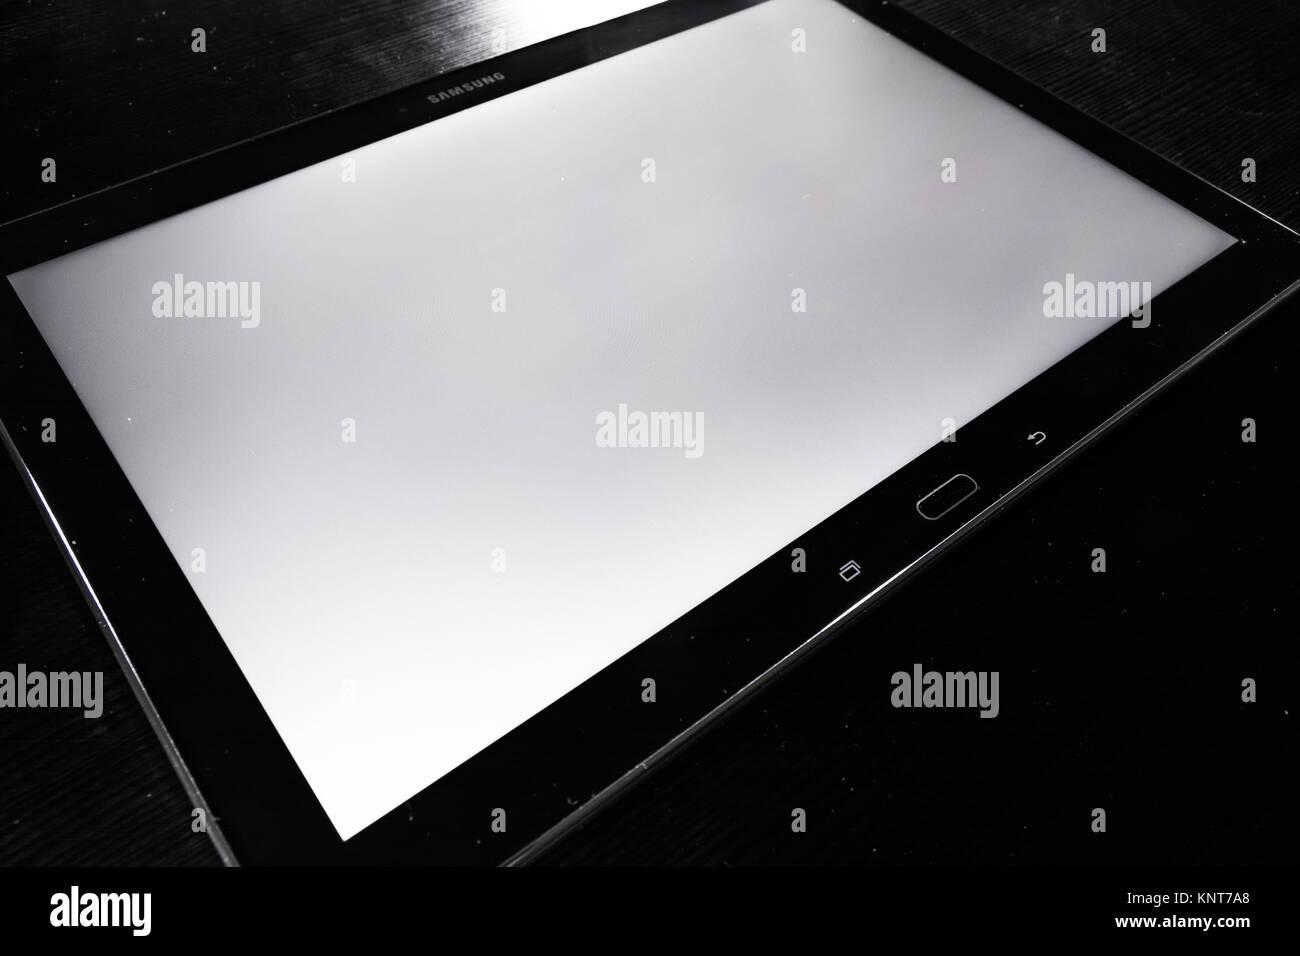 Black Blank Digital Lcd Frame Stock Photos & Black Blank Digital Lcd ...